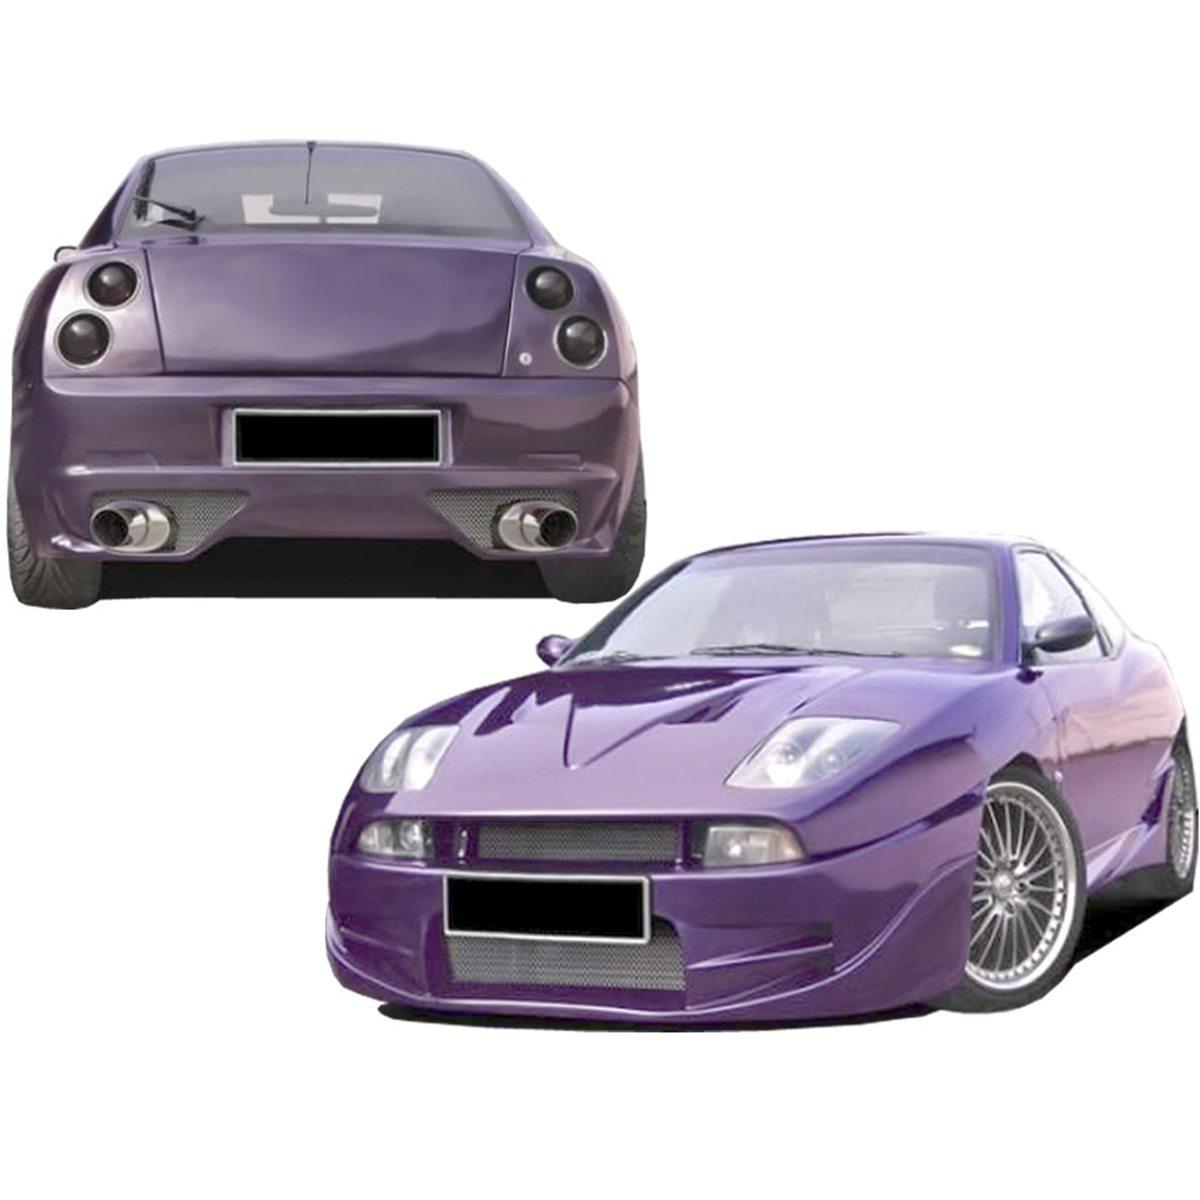 Fiat-Coupe-KIT-KTS028